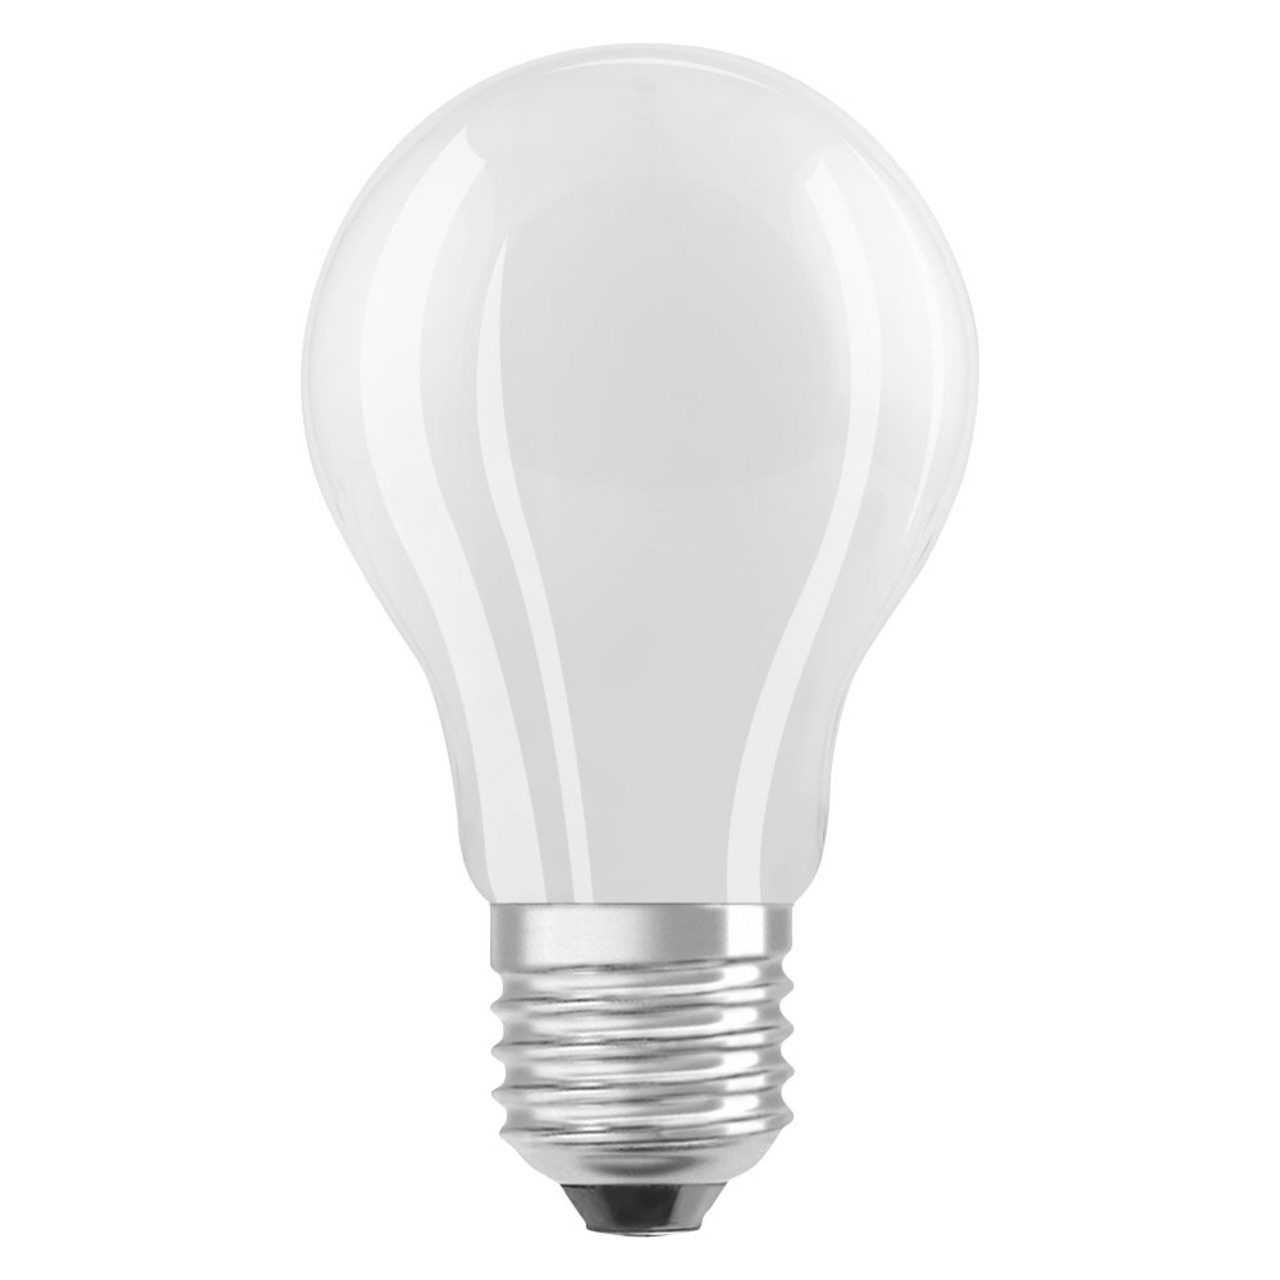 OSRAM LED Superstar 12-W-Filament-LED-Lampe E27- neutralweiund-223 - matt- dimmbar